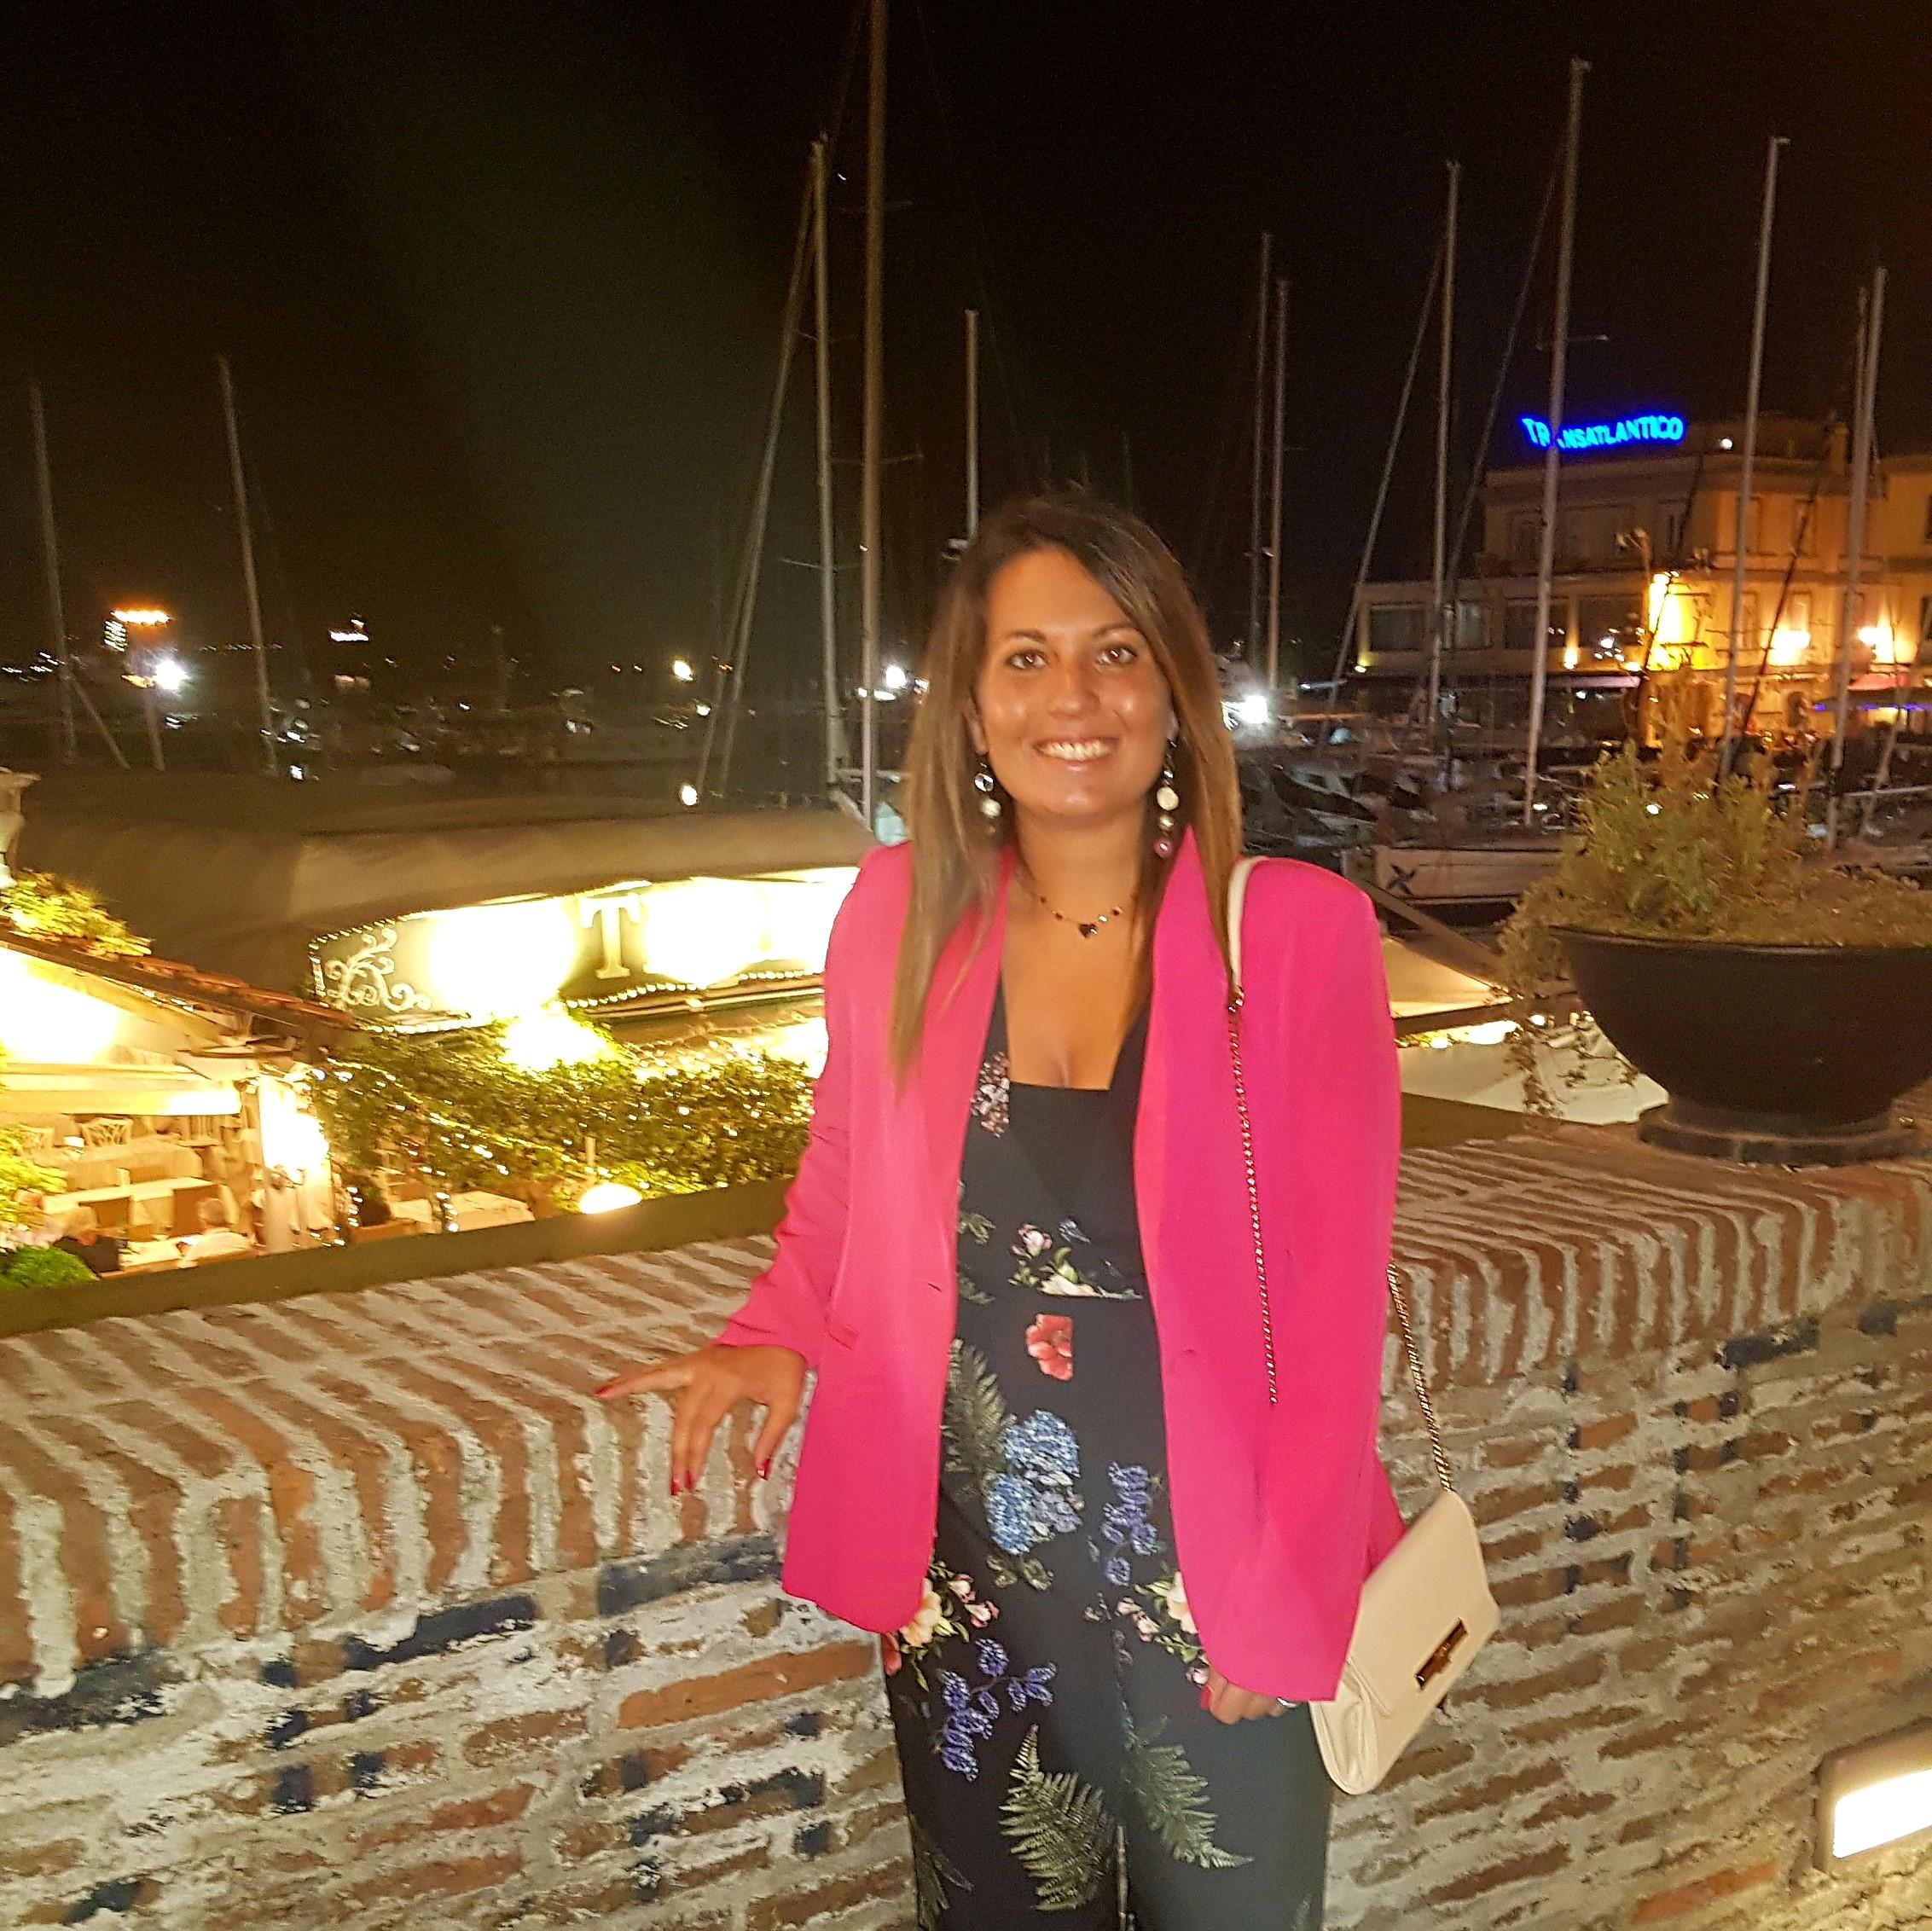 Dott.ssa Valeria Rago